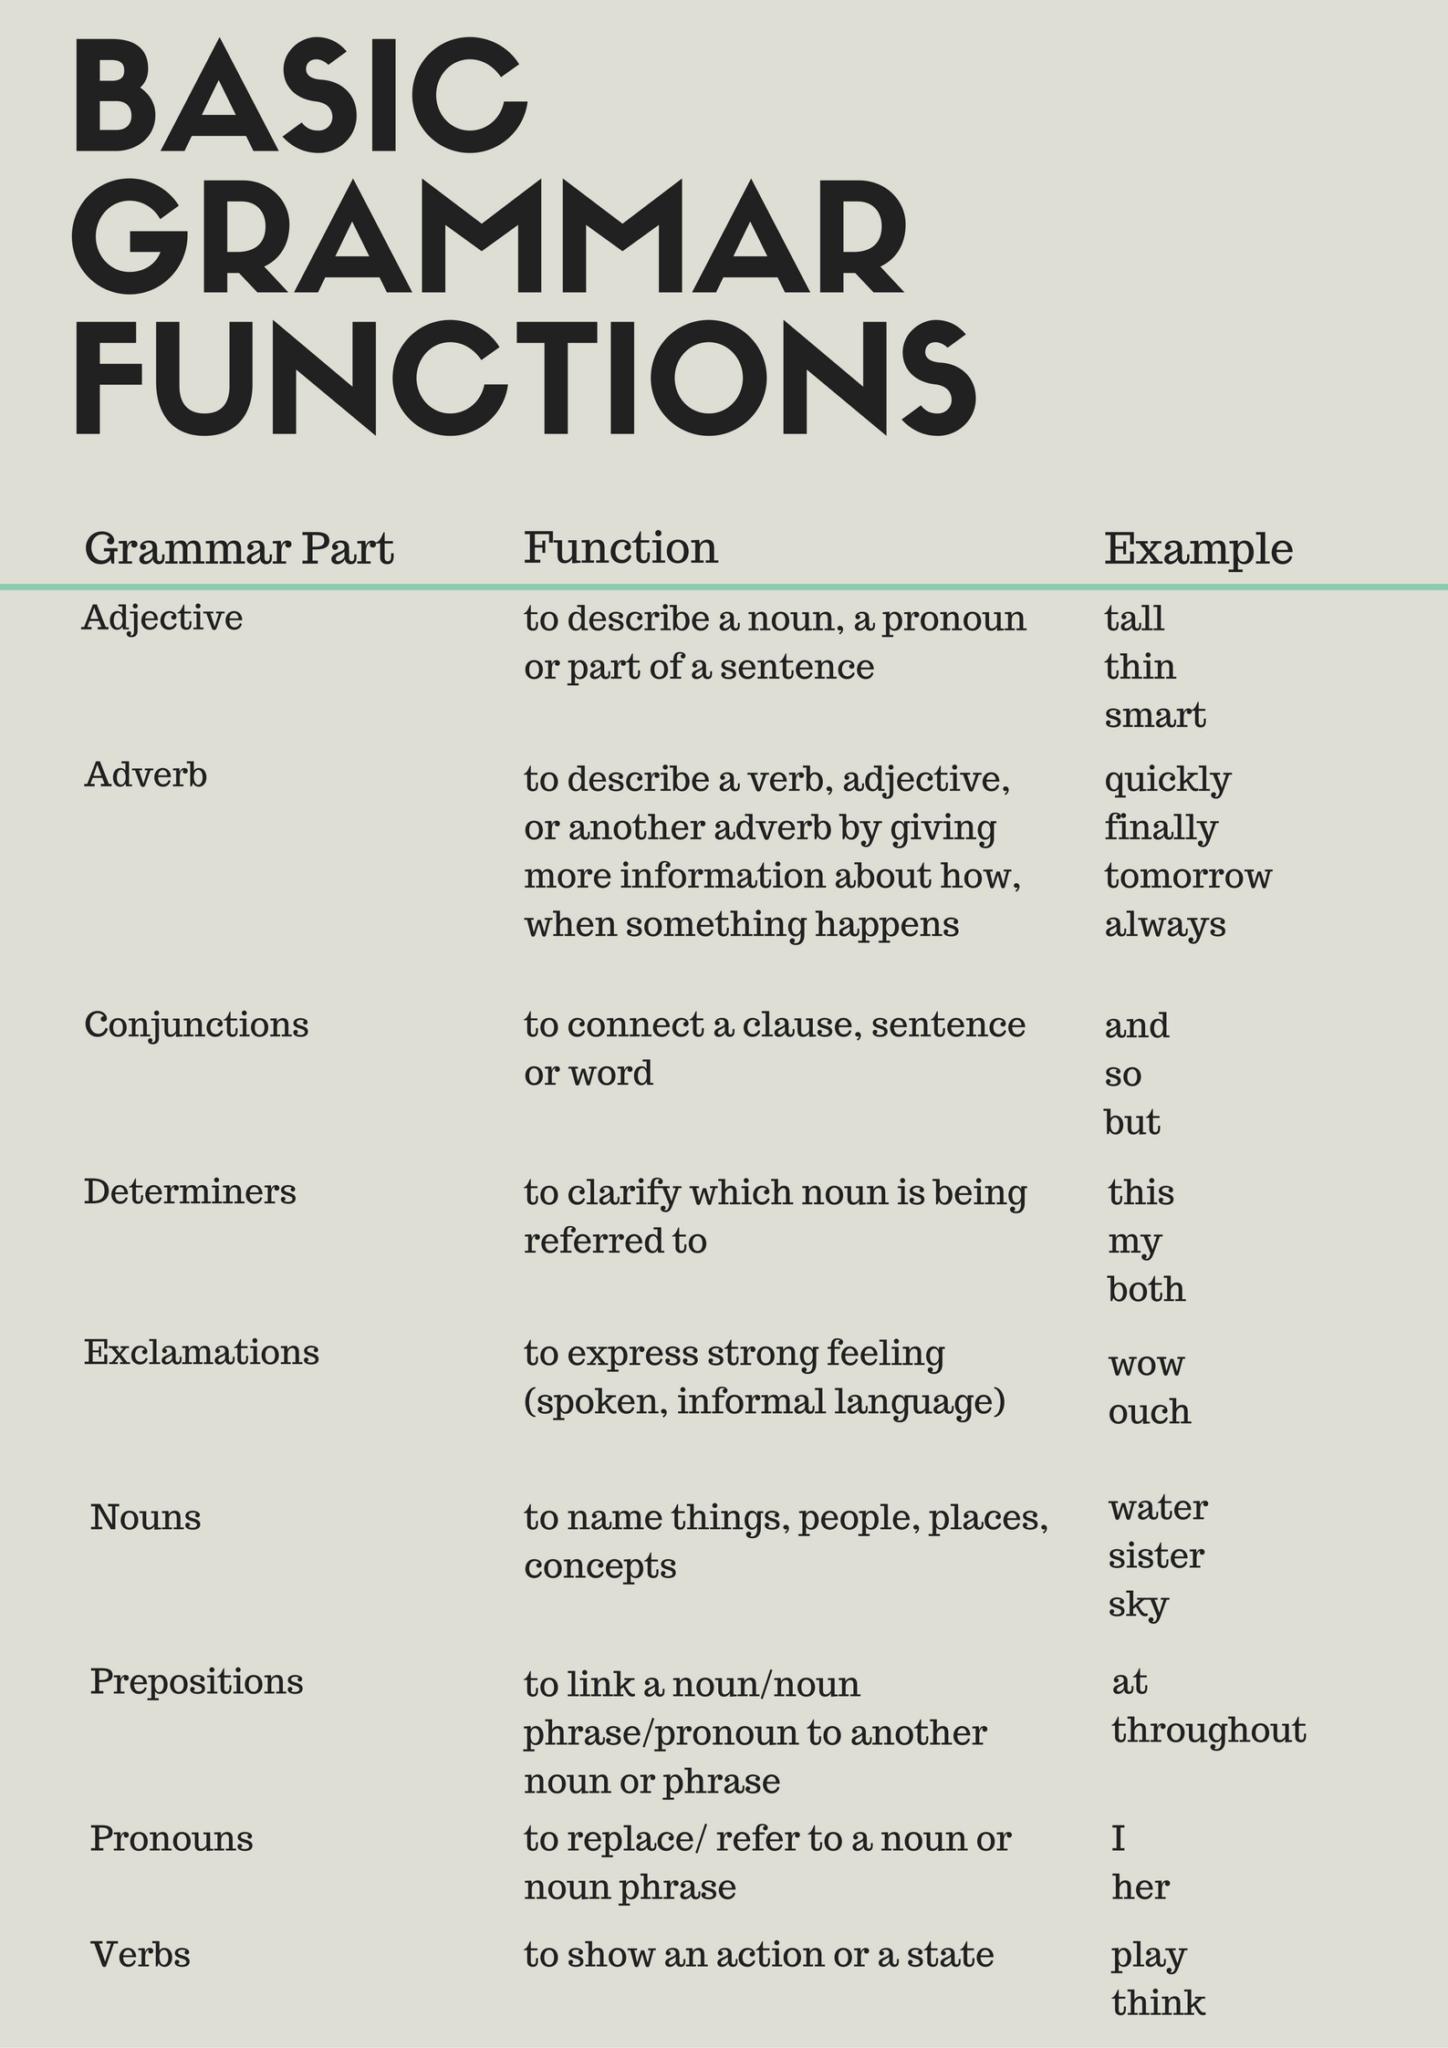 Learn English Grammar Basics Learn English Words Learn English Grammar Learn English [ 2048 x 1448 Pixel ]